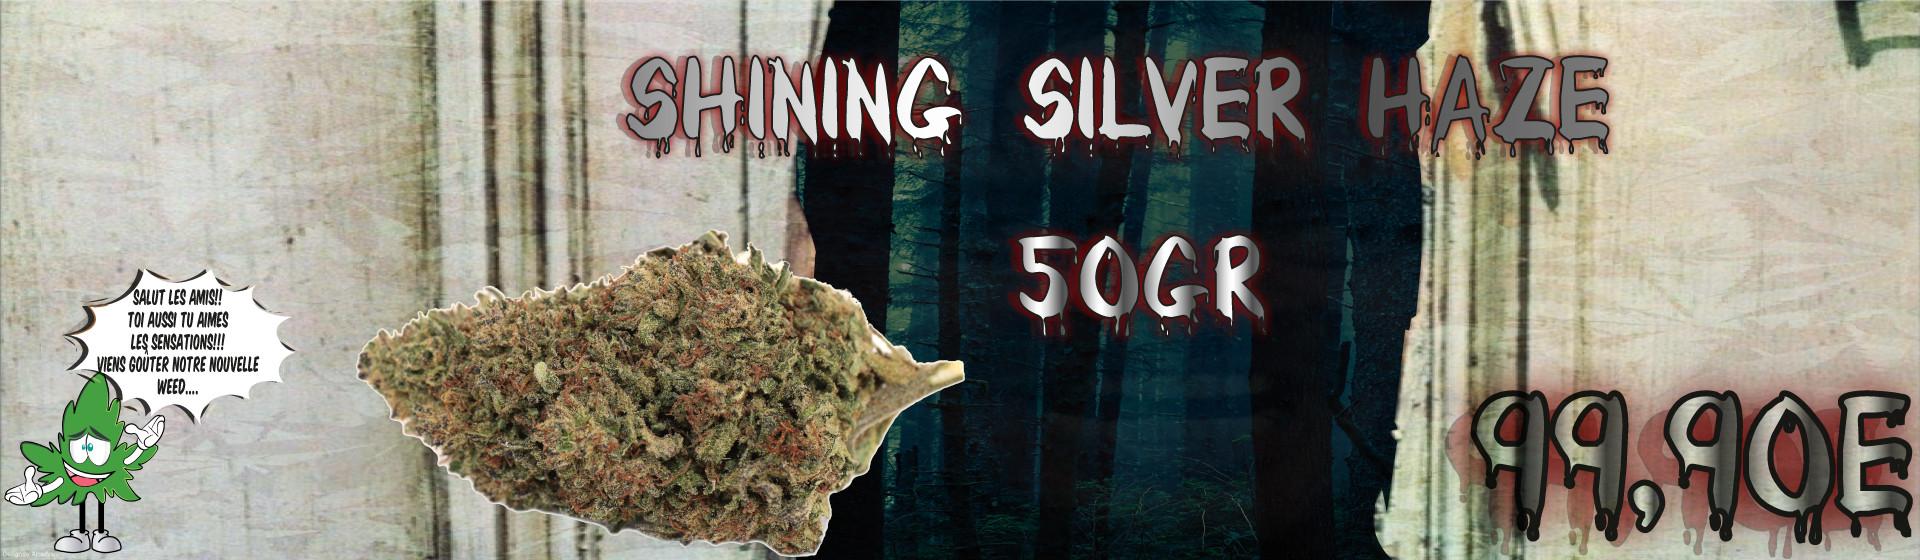 Promo Shining Silver Haze